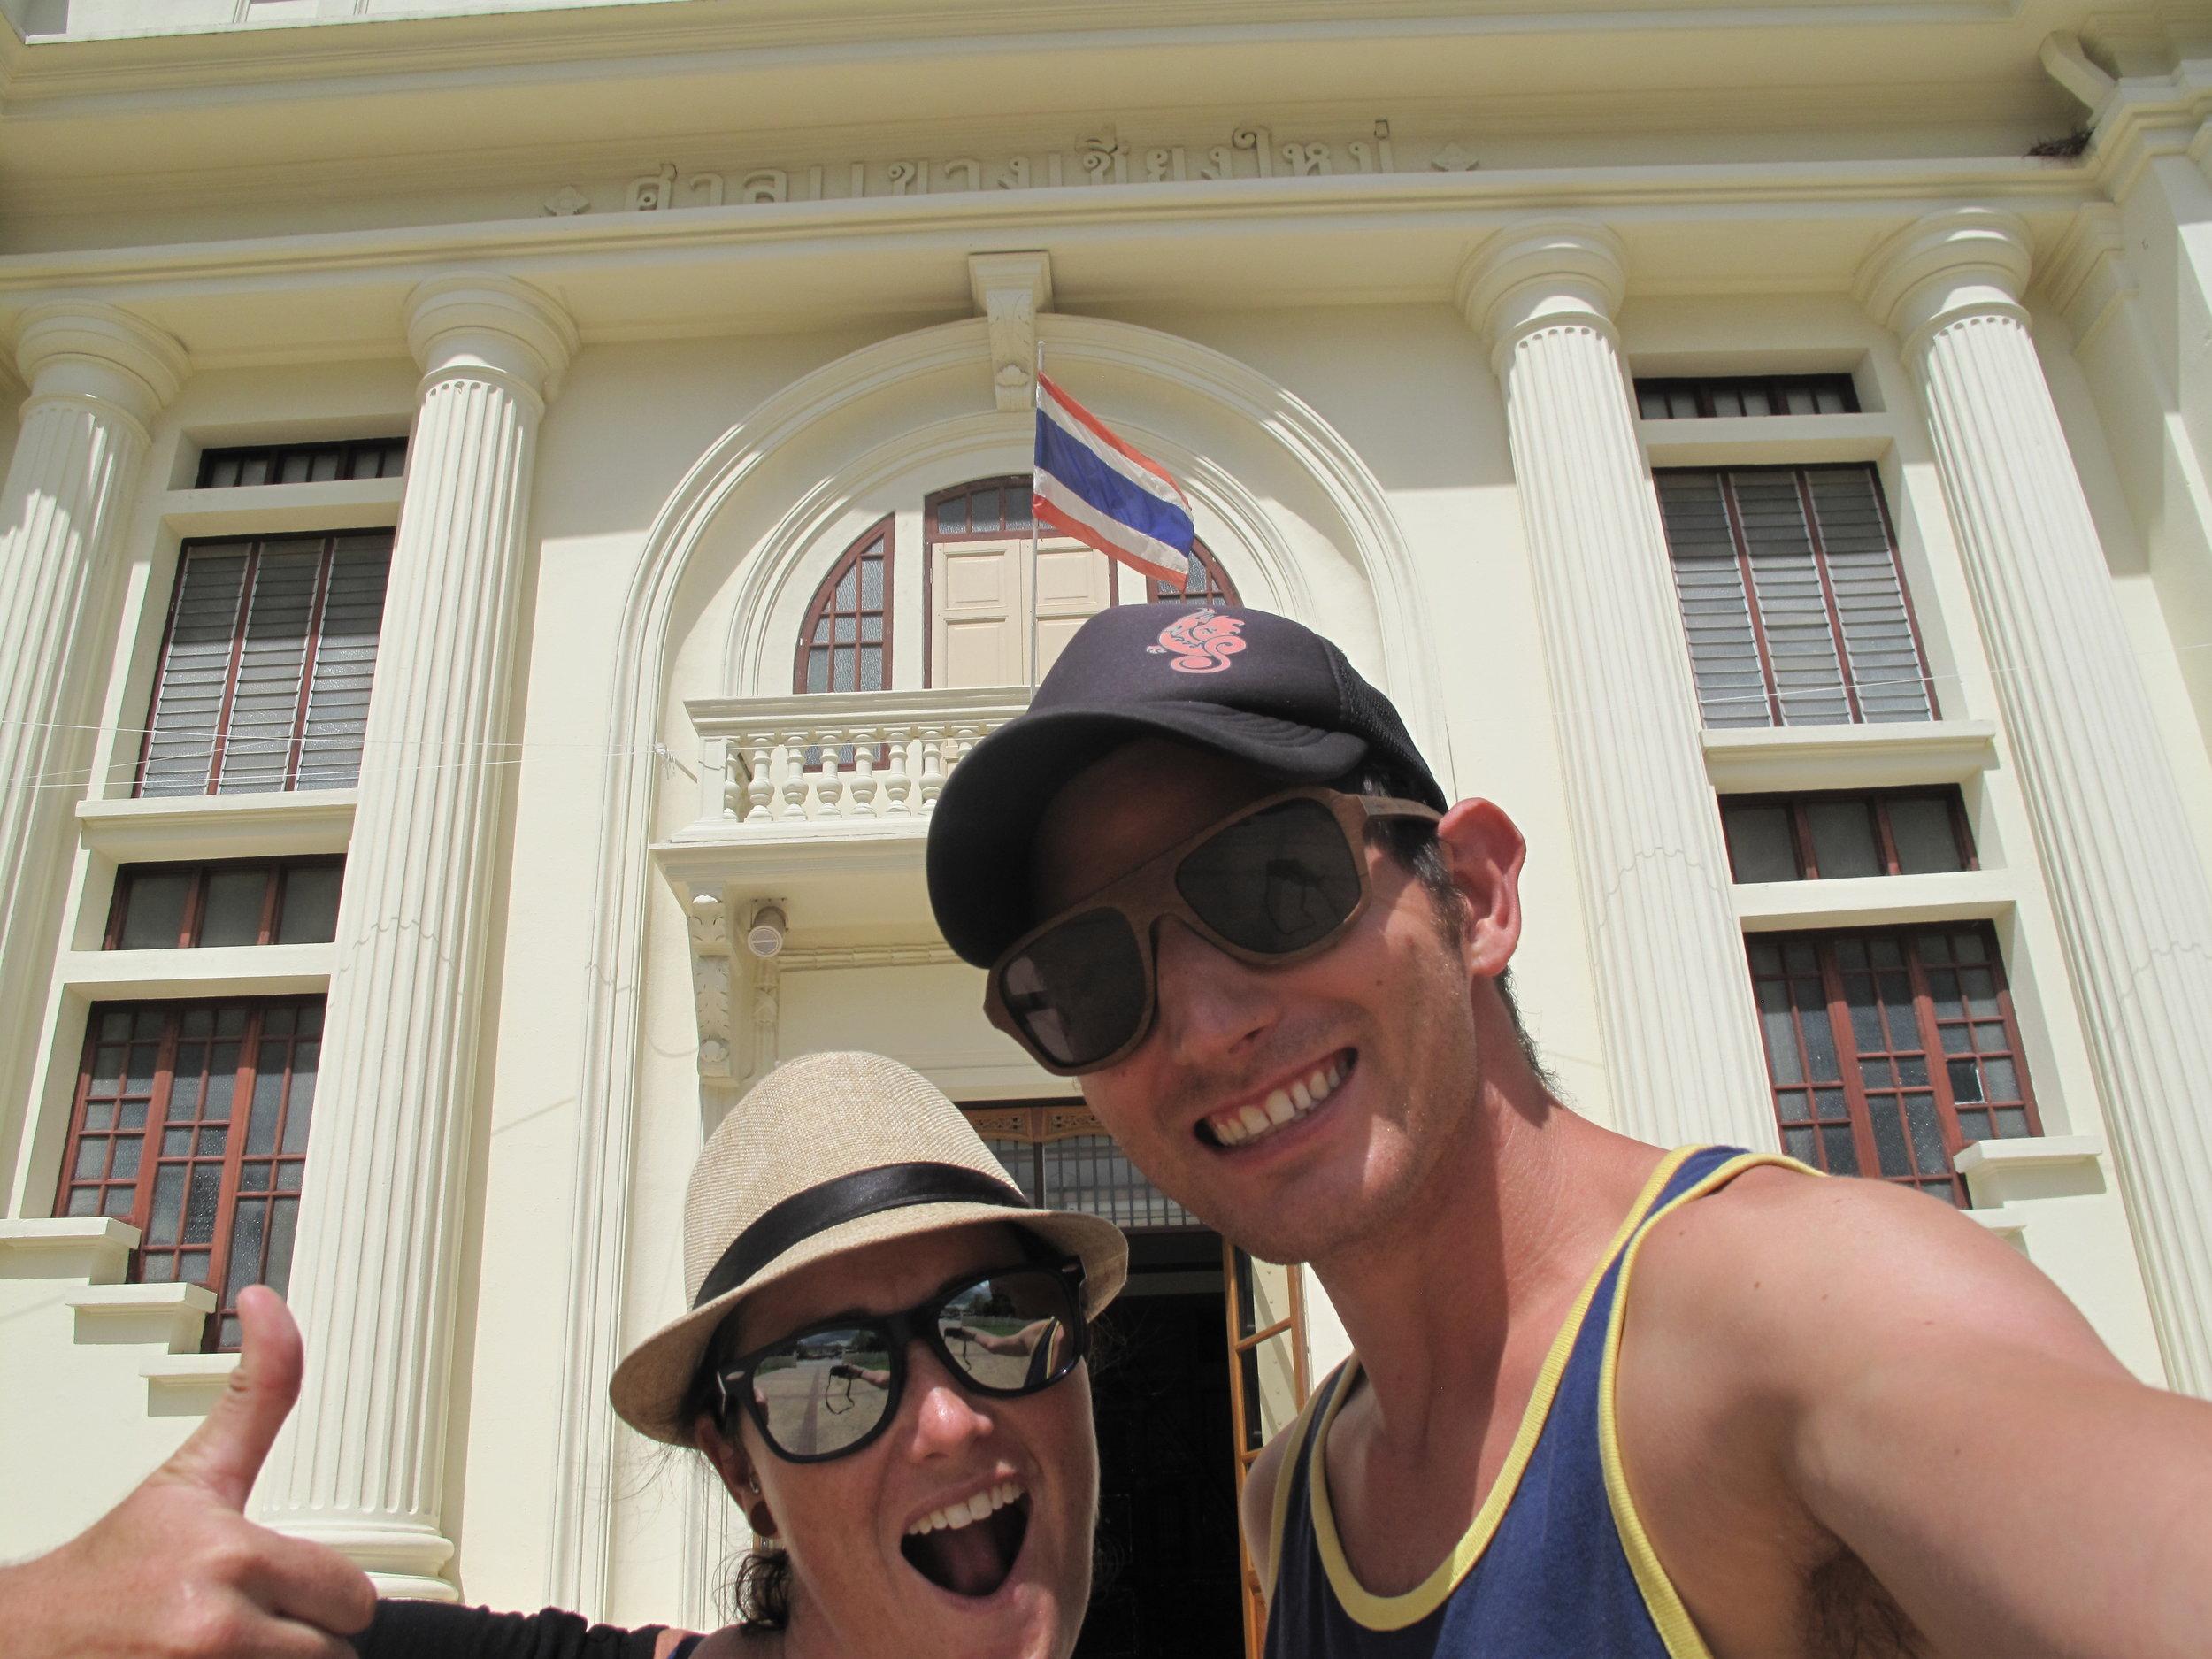 Museum selfie!